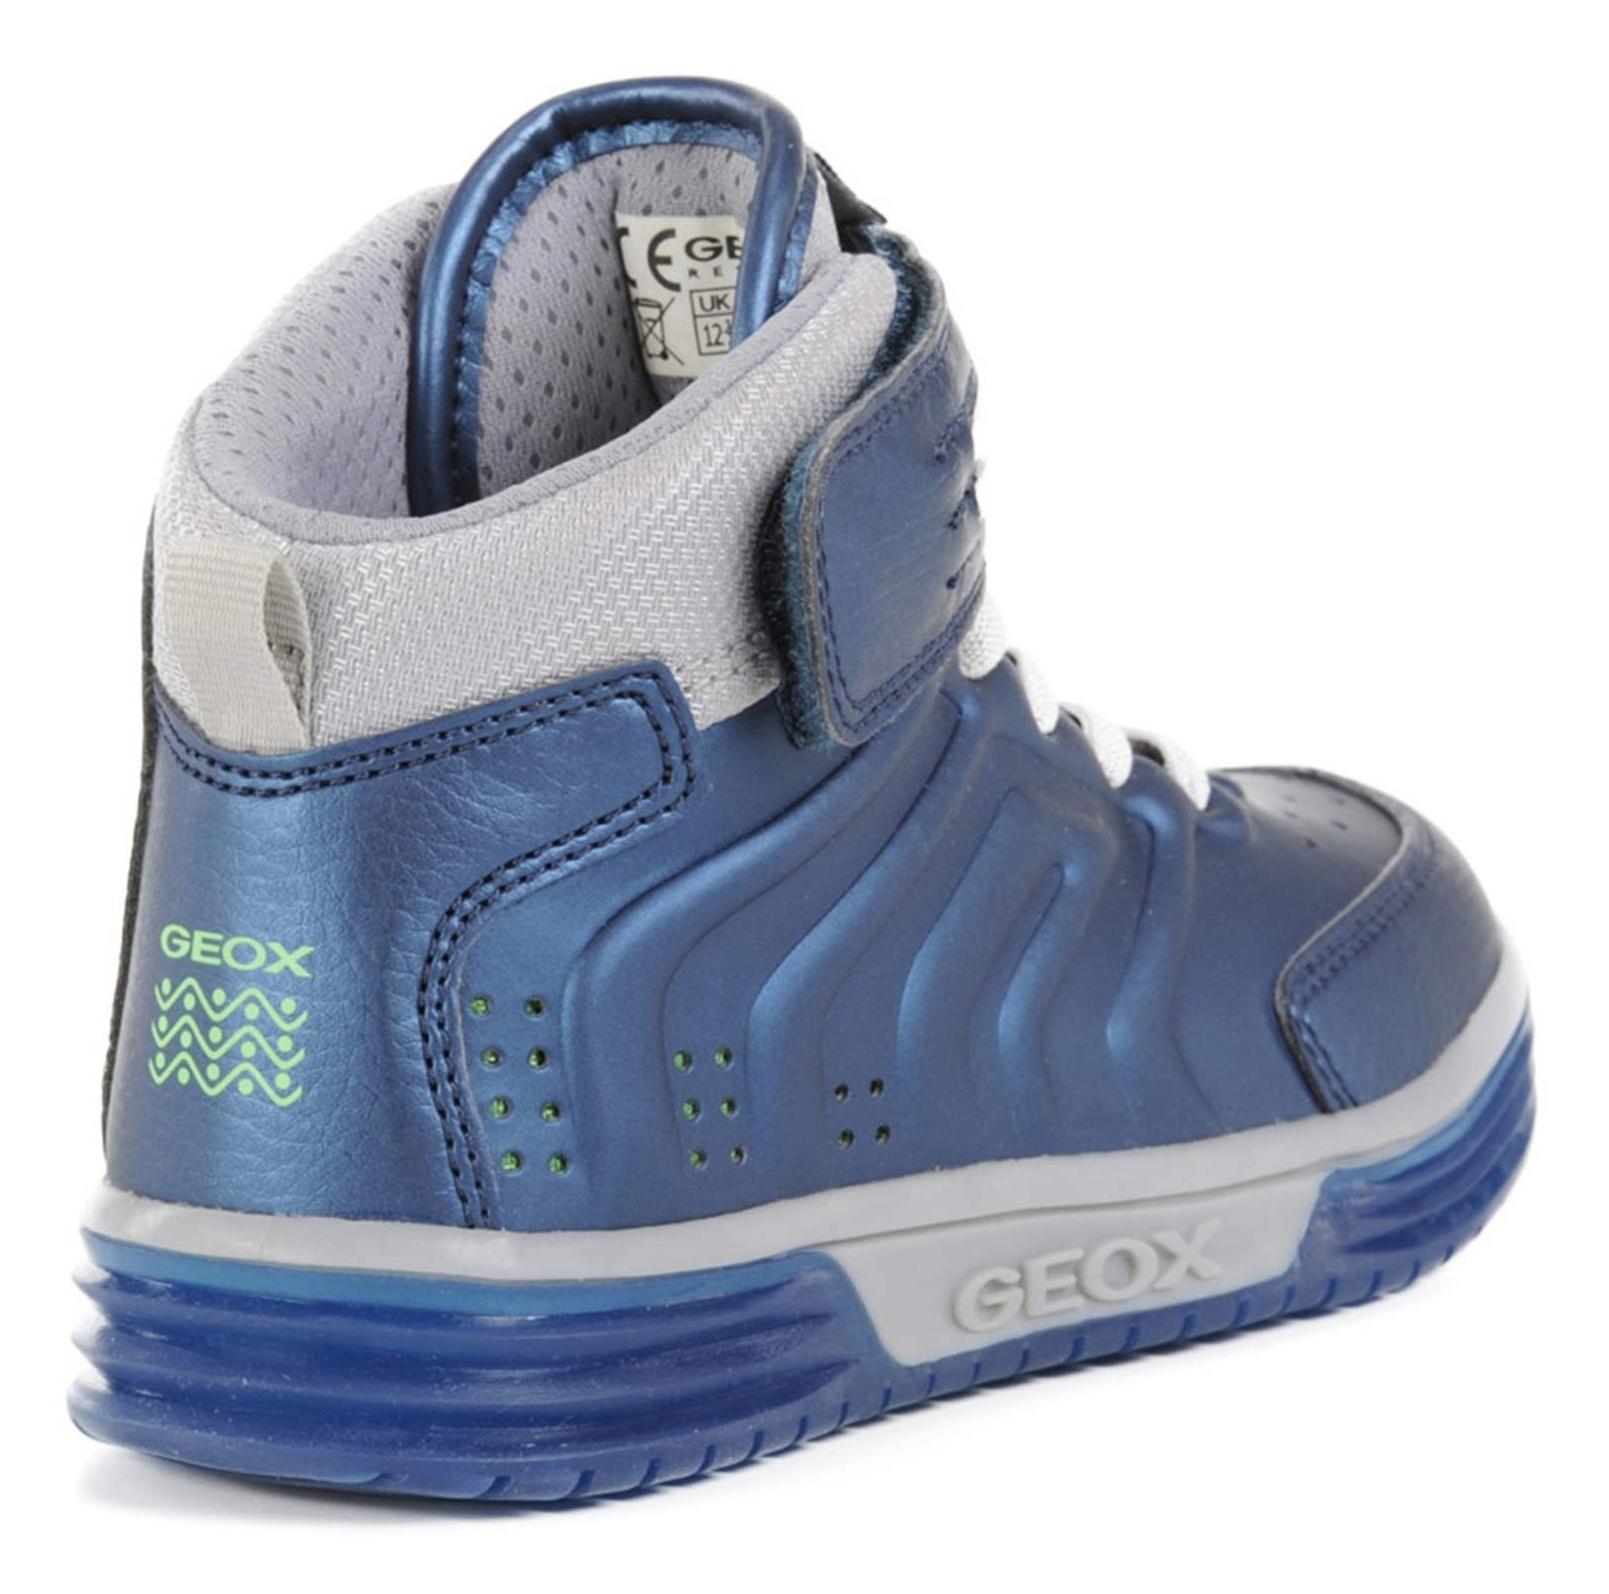 کفش ورزشی پسرانه Argonat - جی اوکس - آبي - 3